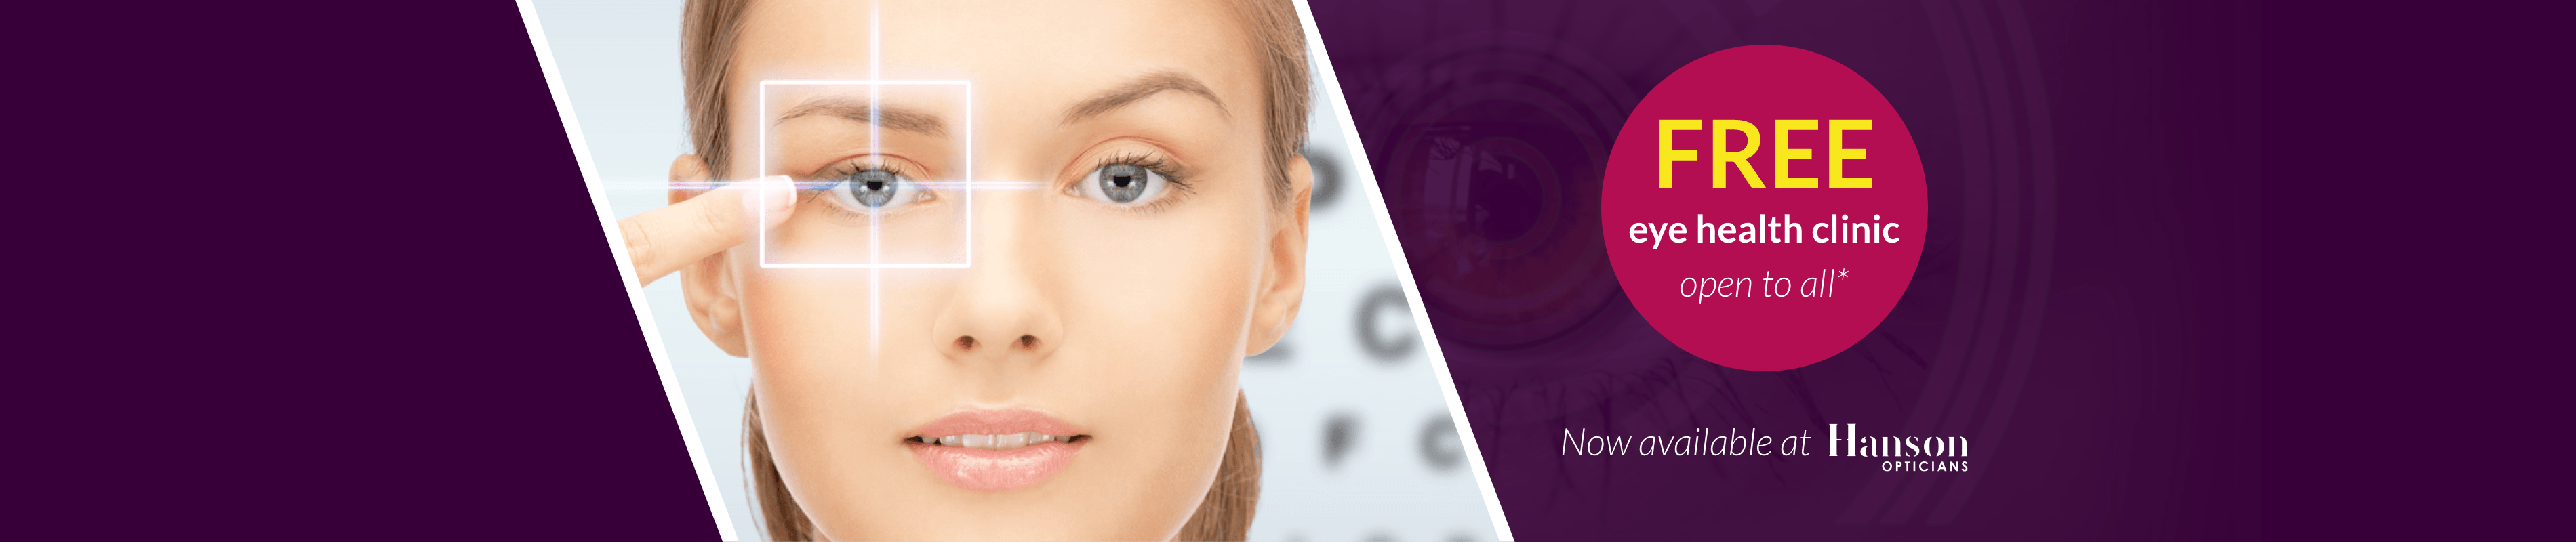 Free-Eye-Health-Clinic-Banner@2X